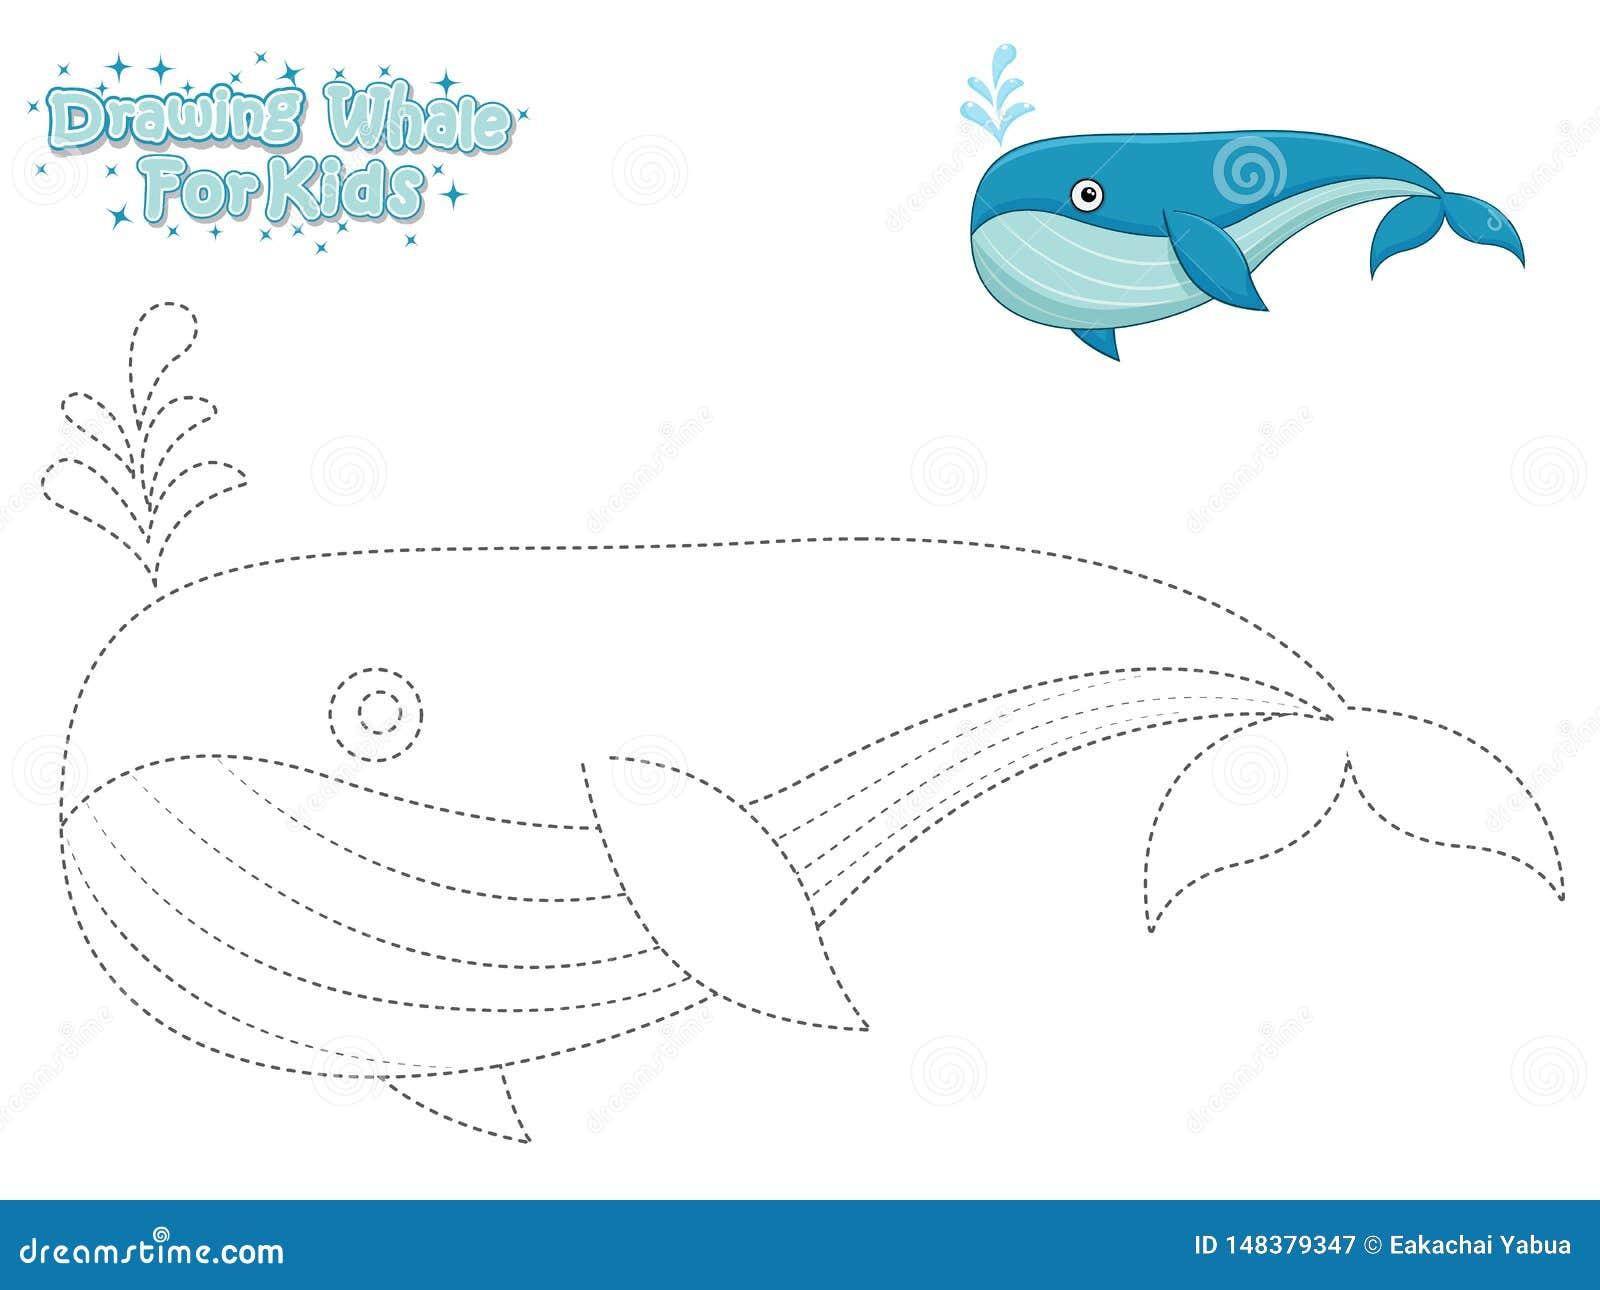 Animal Drawing Sea Stock Illustrations 66 267 Animal Drawing Sea Stock Illustrations Vectors Clipart Dreamstime